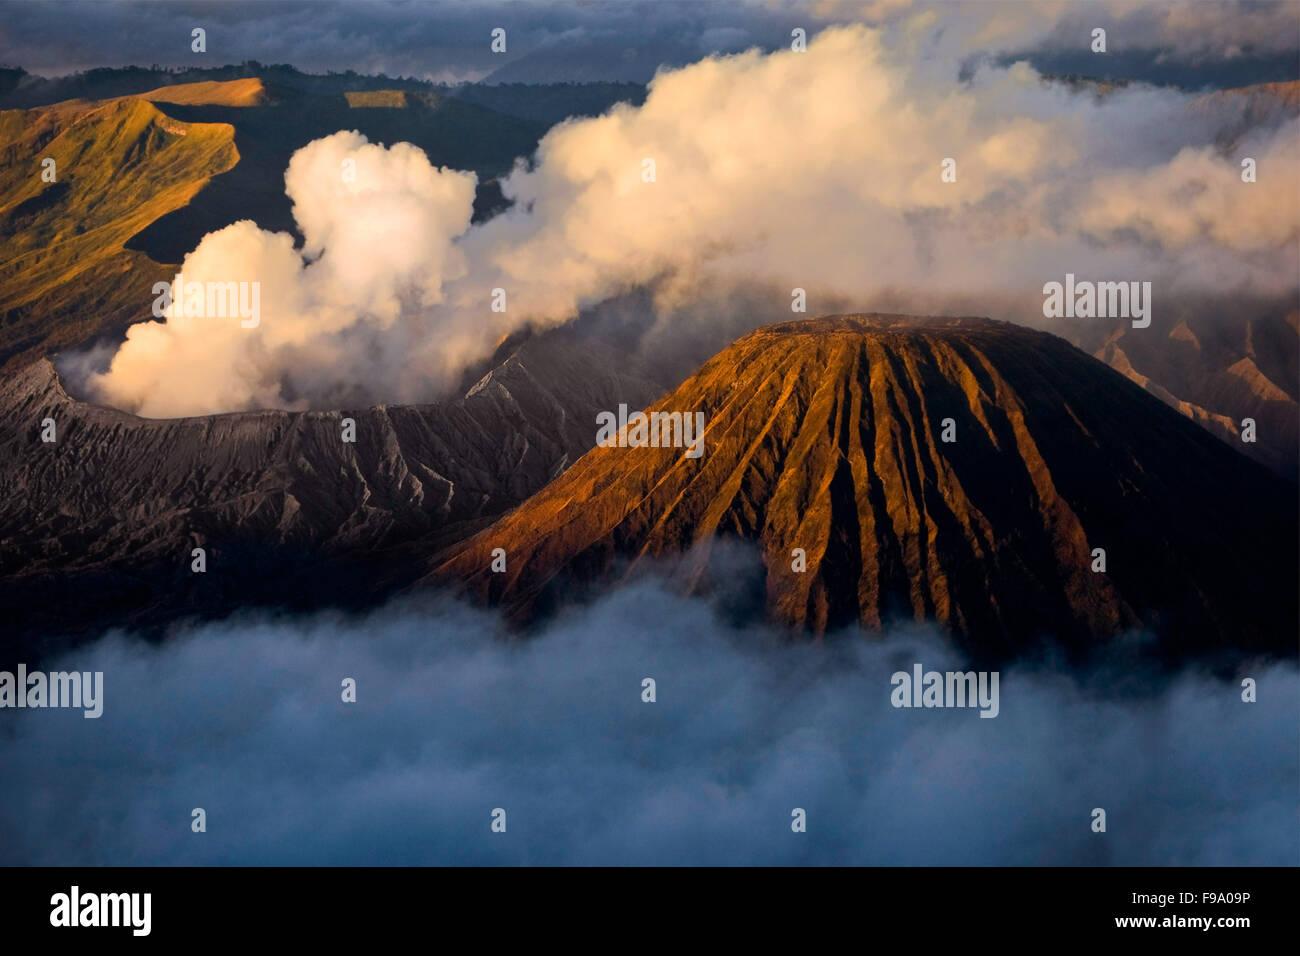 Bromo and Batok volcanoes, East Java, Indonesia. - Stock Image